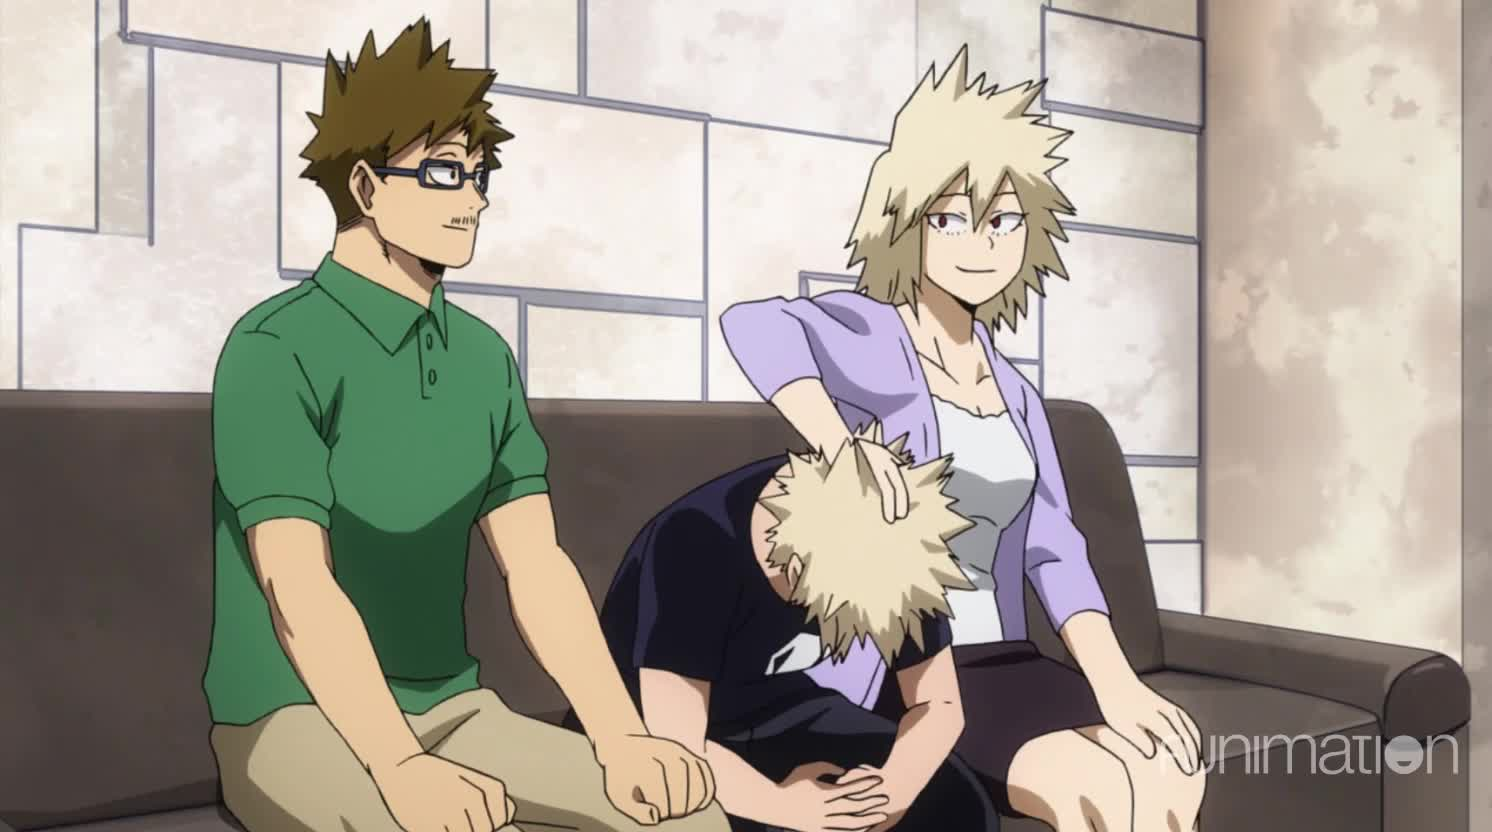 Anime, Boku no Hero Academia, BokunoHeroAcademia, Funimation, My Hero Academia Episode 50, My Hero Academia Season 3, MyHeroAcademia, MyHeroAcademiaEpisode50, Shounen, Shounen Anime, Shounen Jump, ShounenJump, action, comedy, drama, sci-fi, superhero, superheroes, agree GIFs